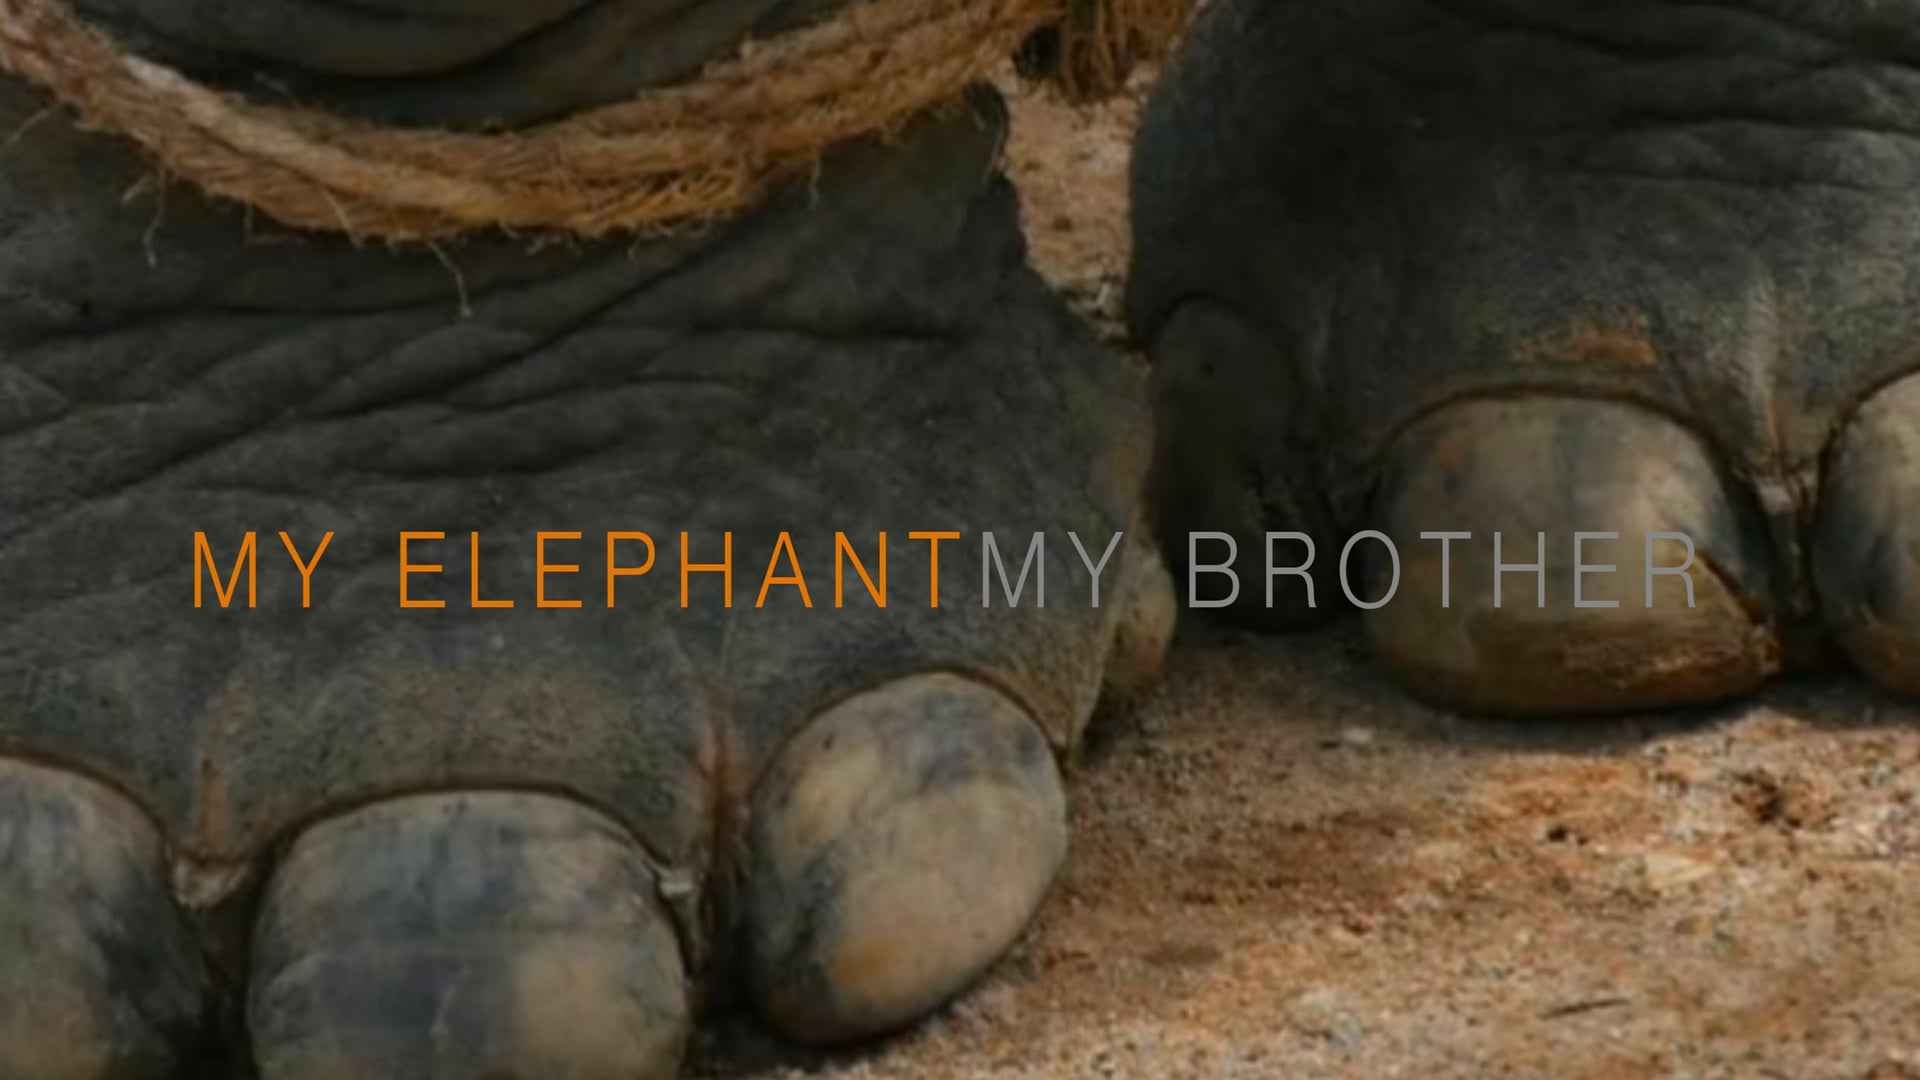 My Elephant, My Brother